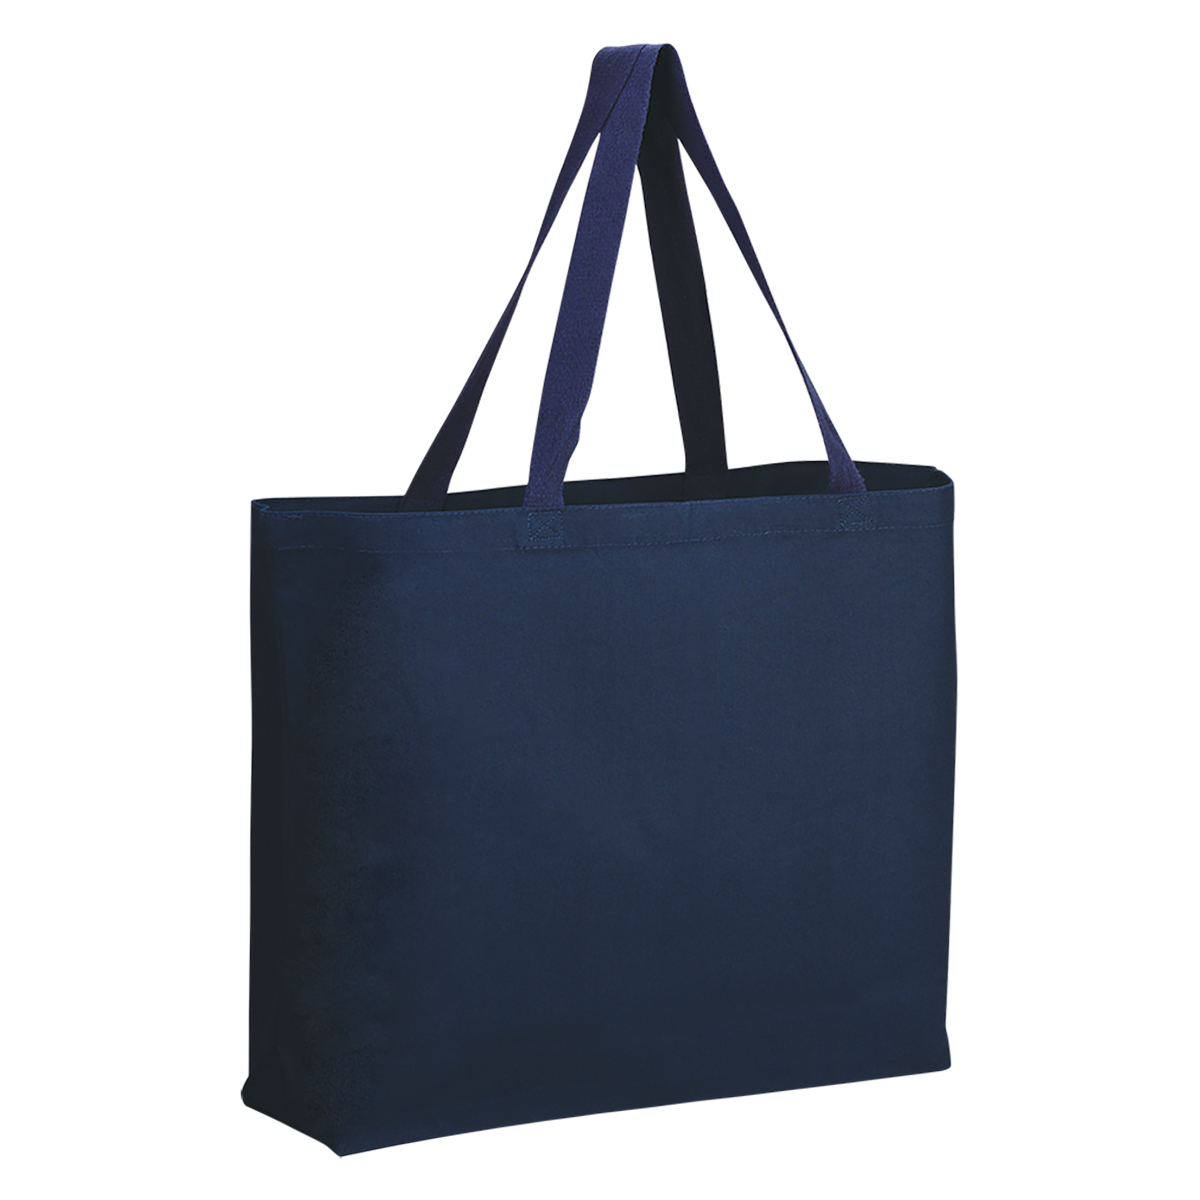 Tees Canvas Gusseted Jumbo Tote Bag   T-Shirt.ca 13170246f4